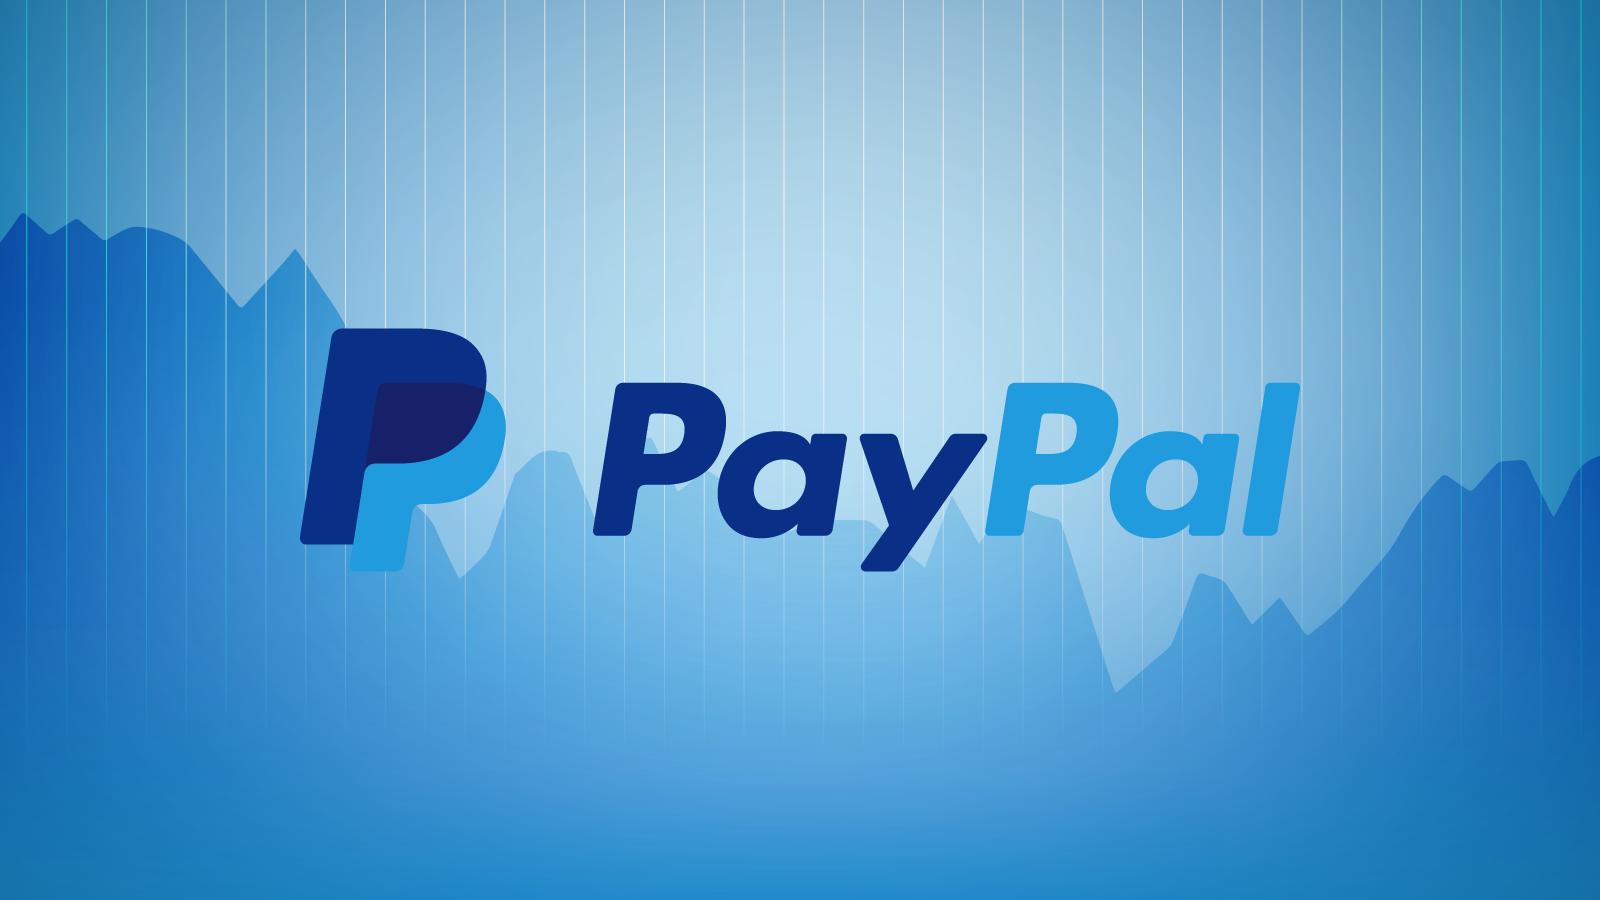 PayPal Stock: A Good Way to Play the Crypto Bull Run?